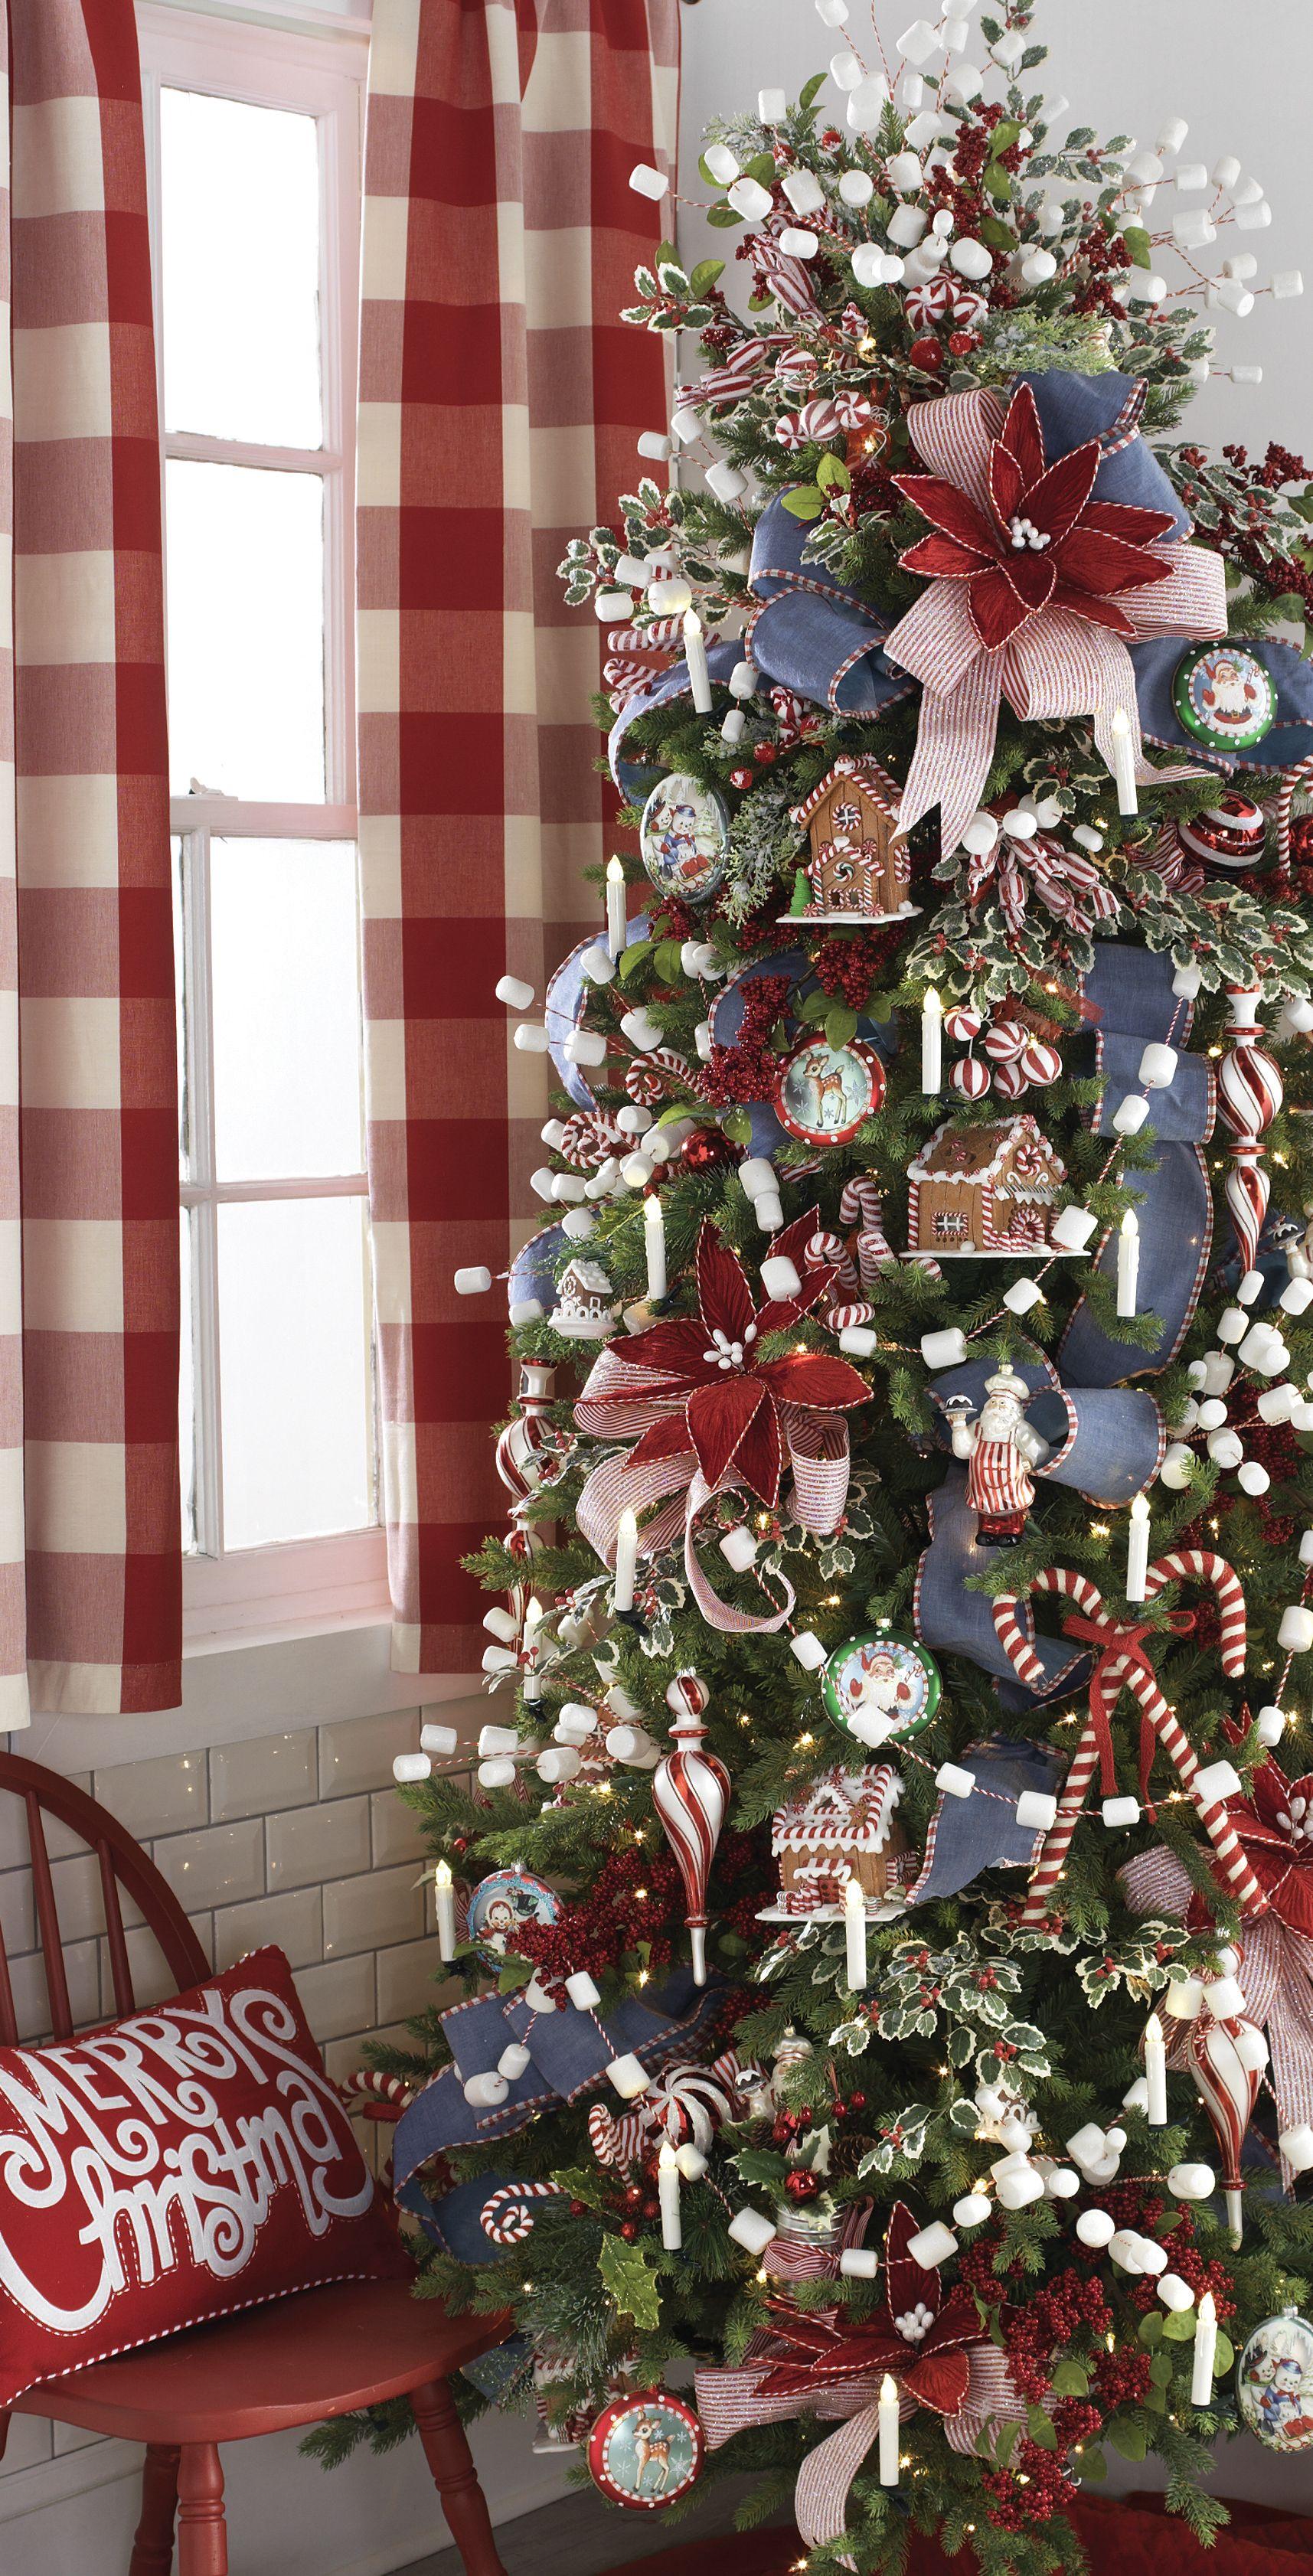 Peppermint Kitchen Christmas Tree. By RAZ Imports. | Christmas Tree ...